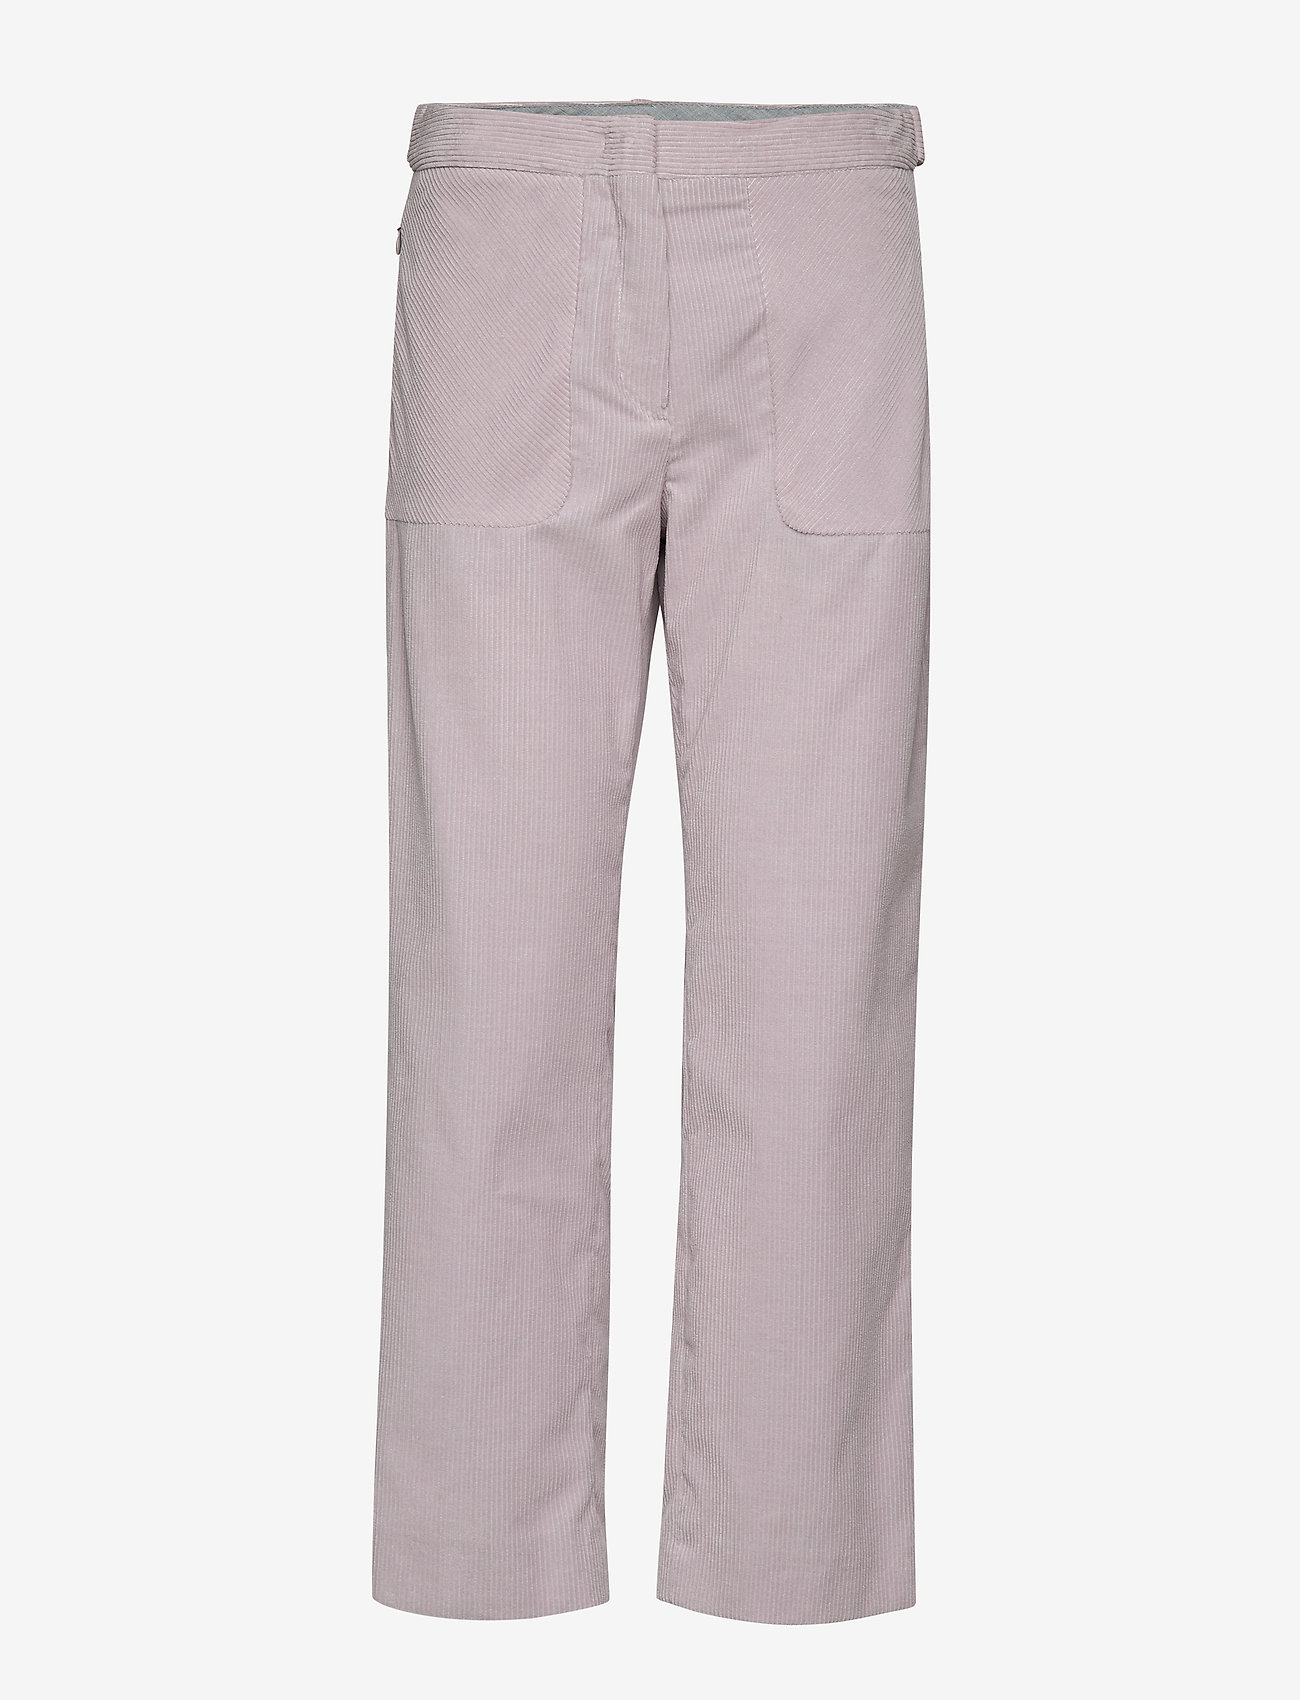 Sportmax Code - ROLANDA - leveälahkeiset housut - pearl grey